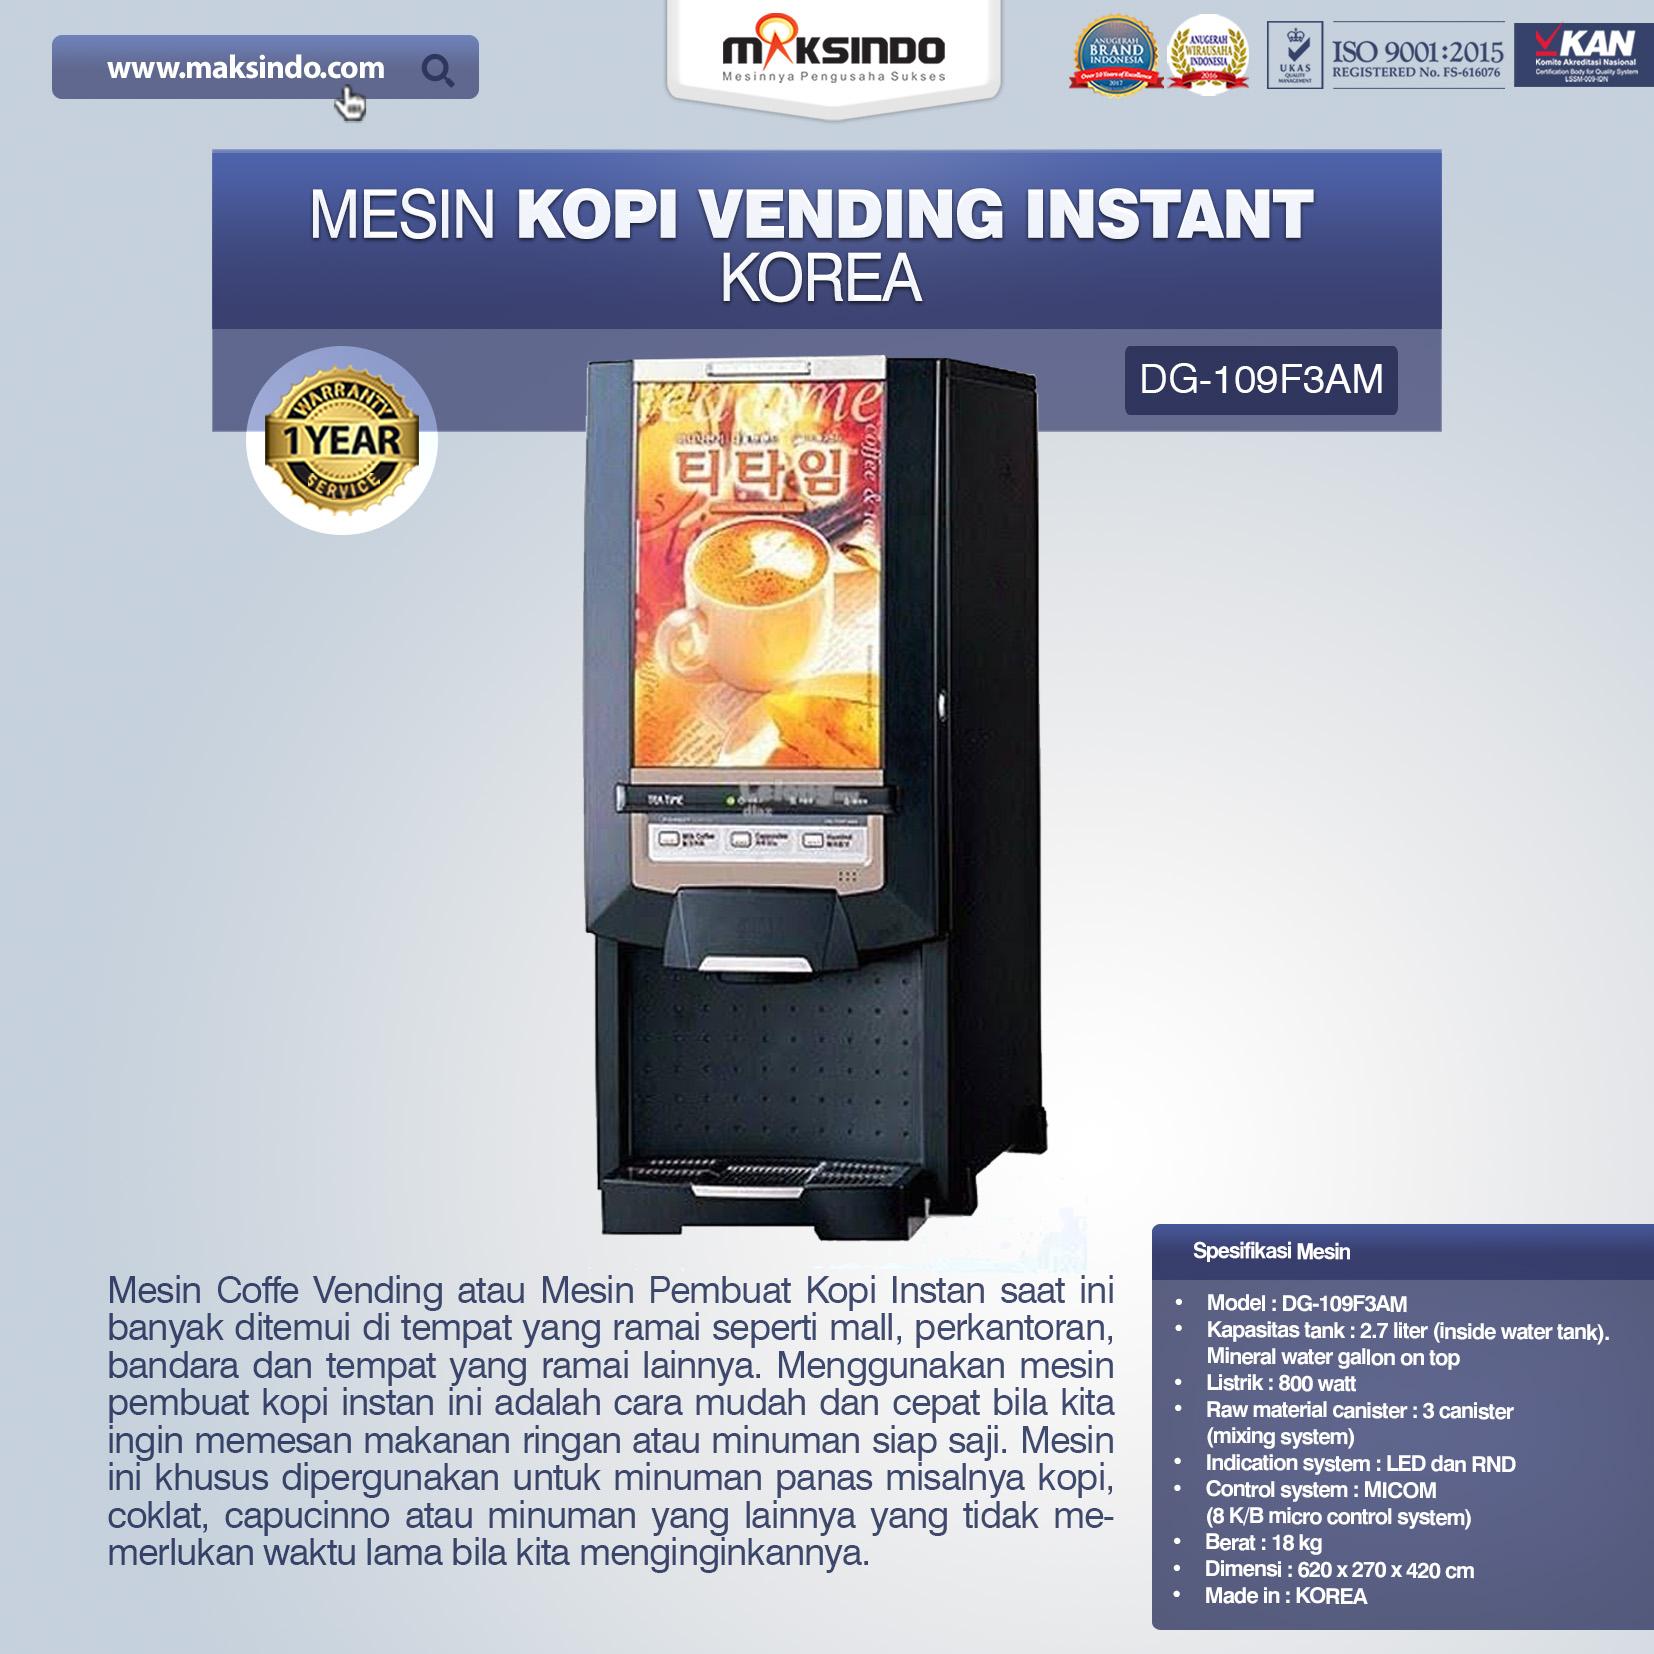 Jual Mesin Kopi Instant (Auto Coffee Instant Machine) di Blitar